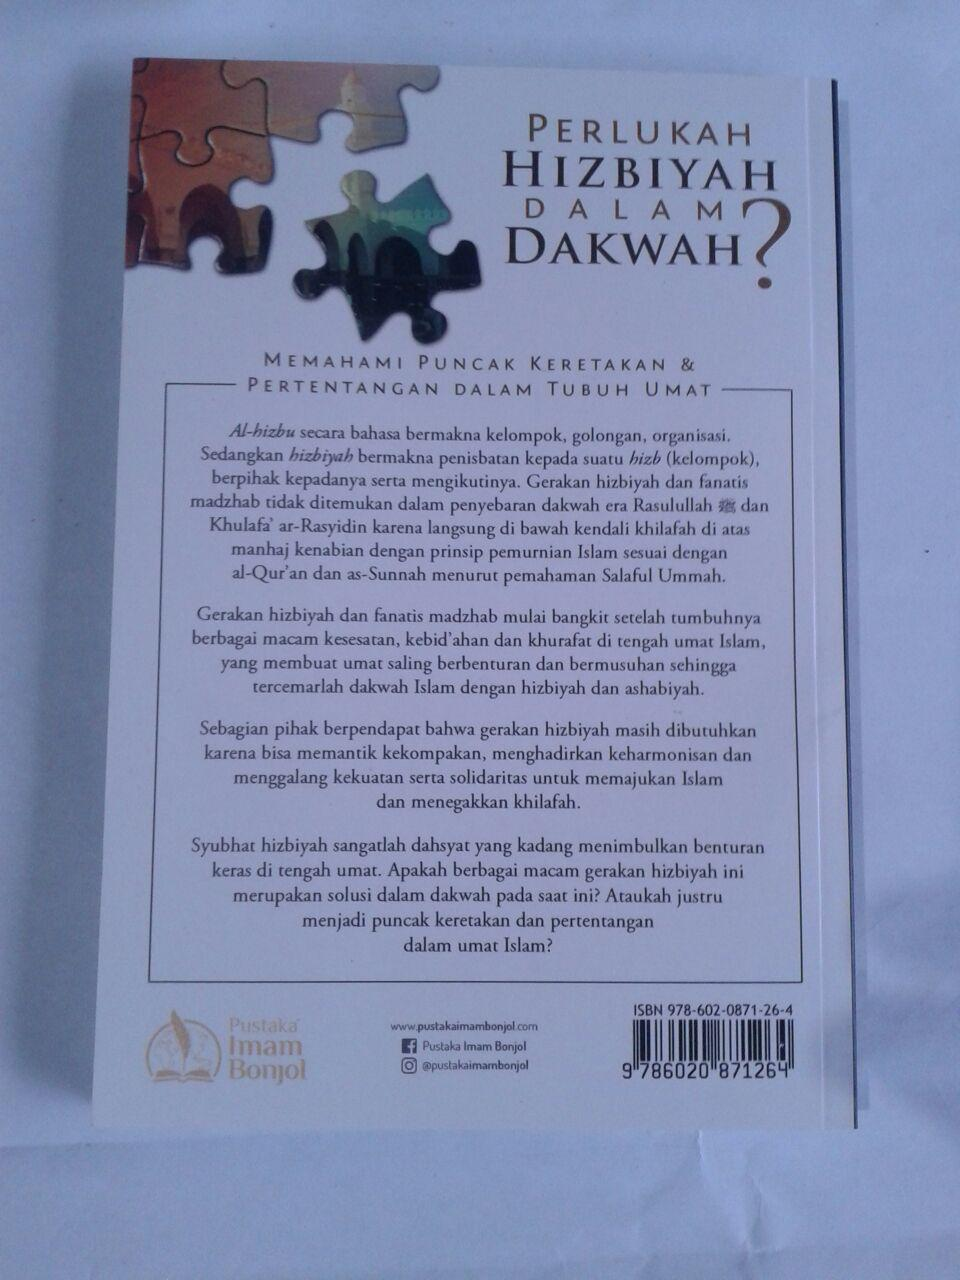 Buku Perlukan Hizbiyah Dalam Dakwah cover